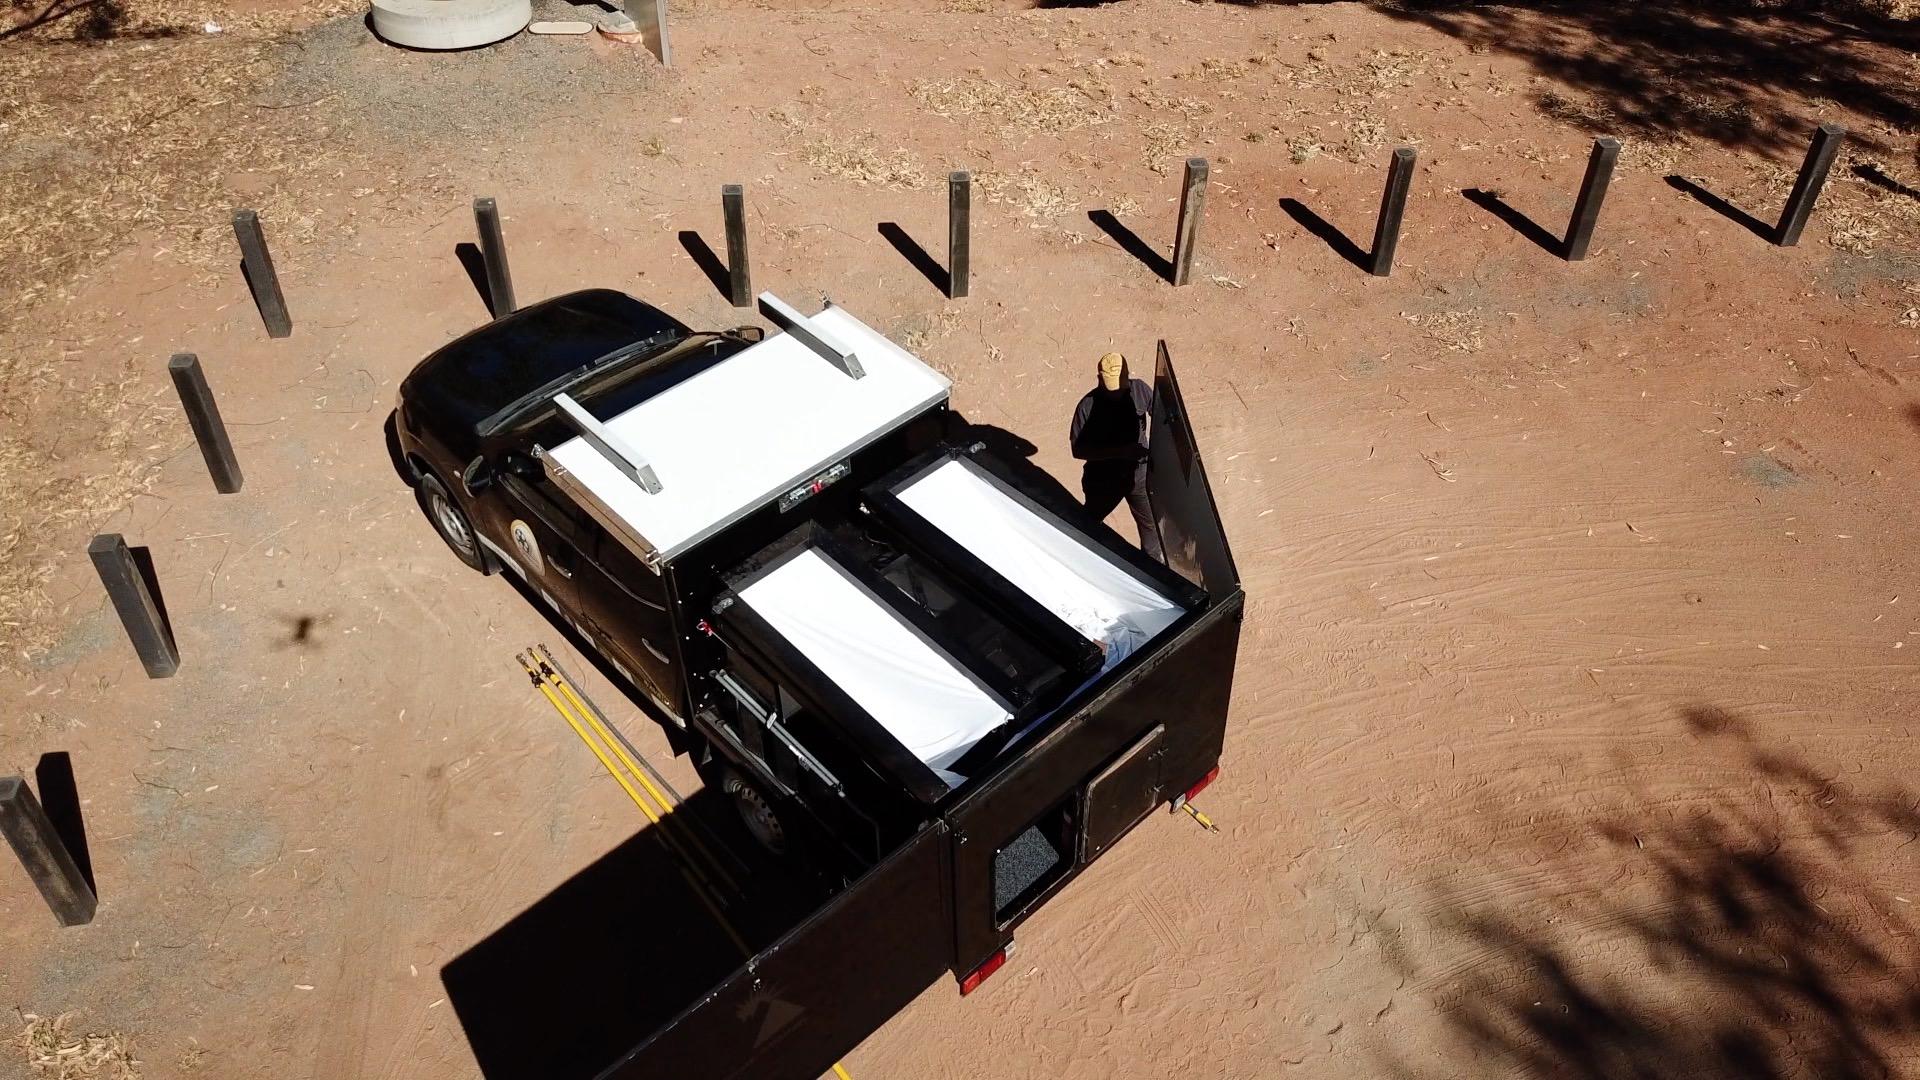 Truck unfolding 3.jpg